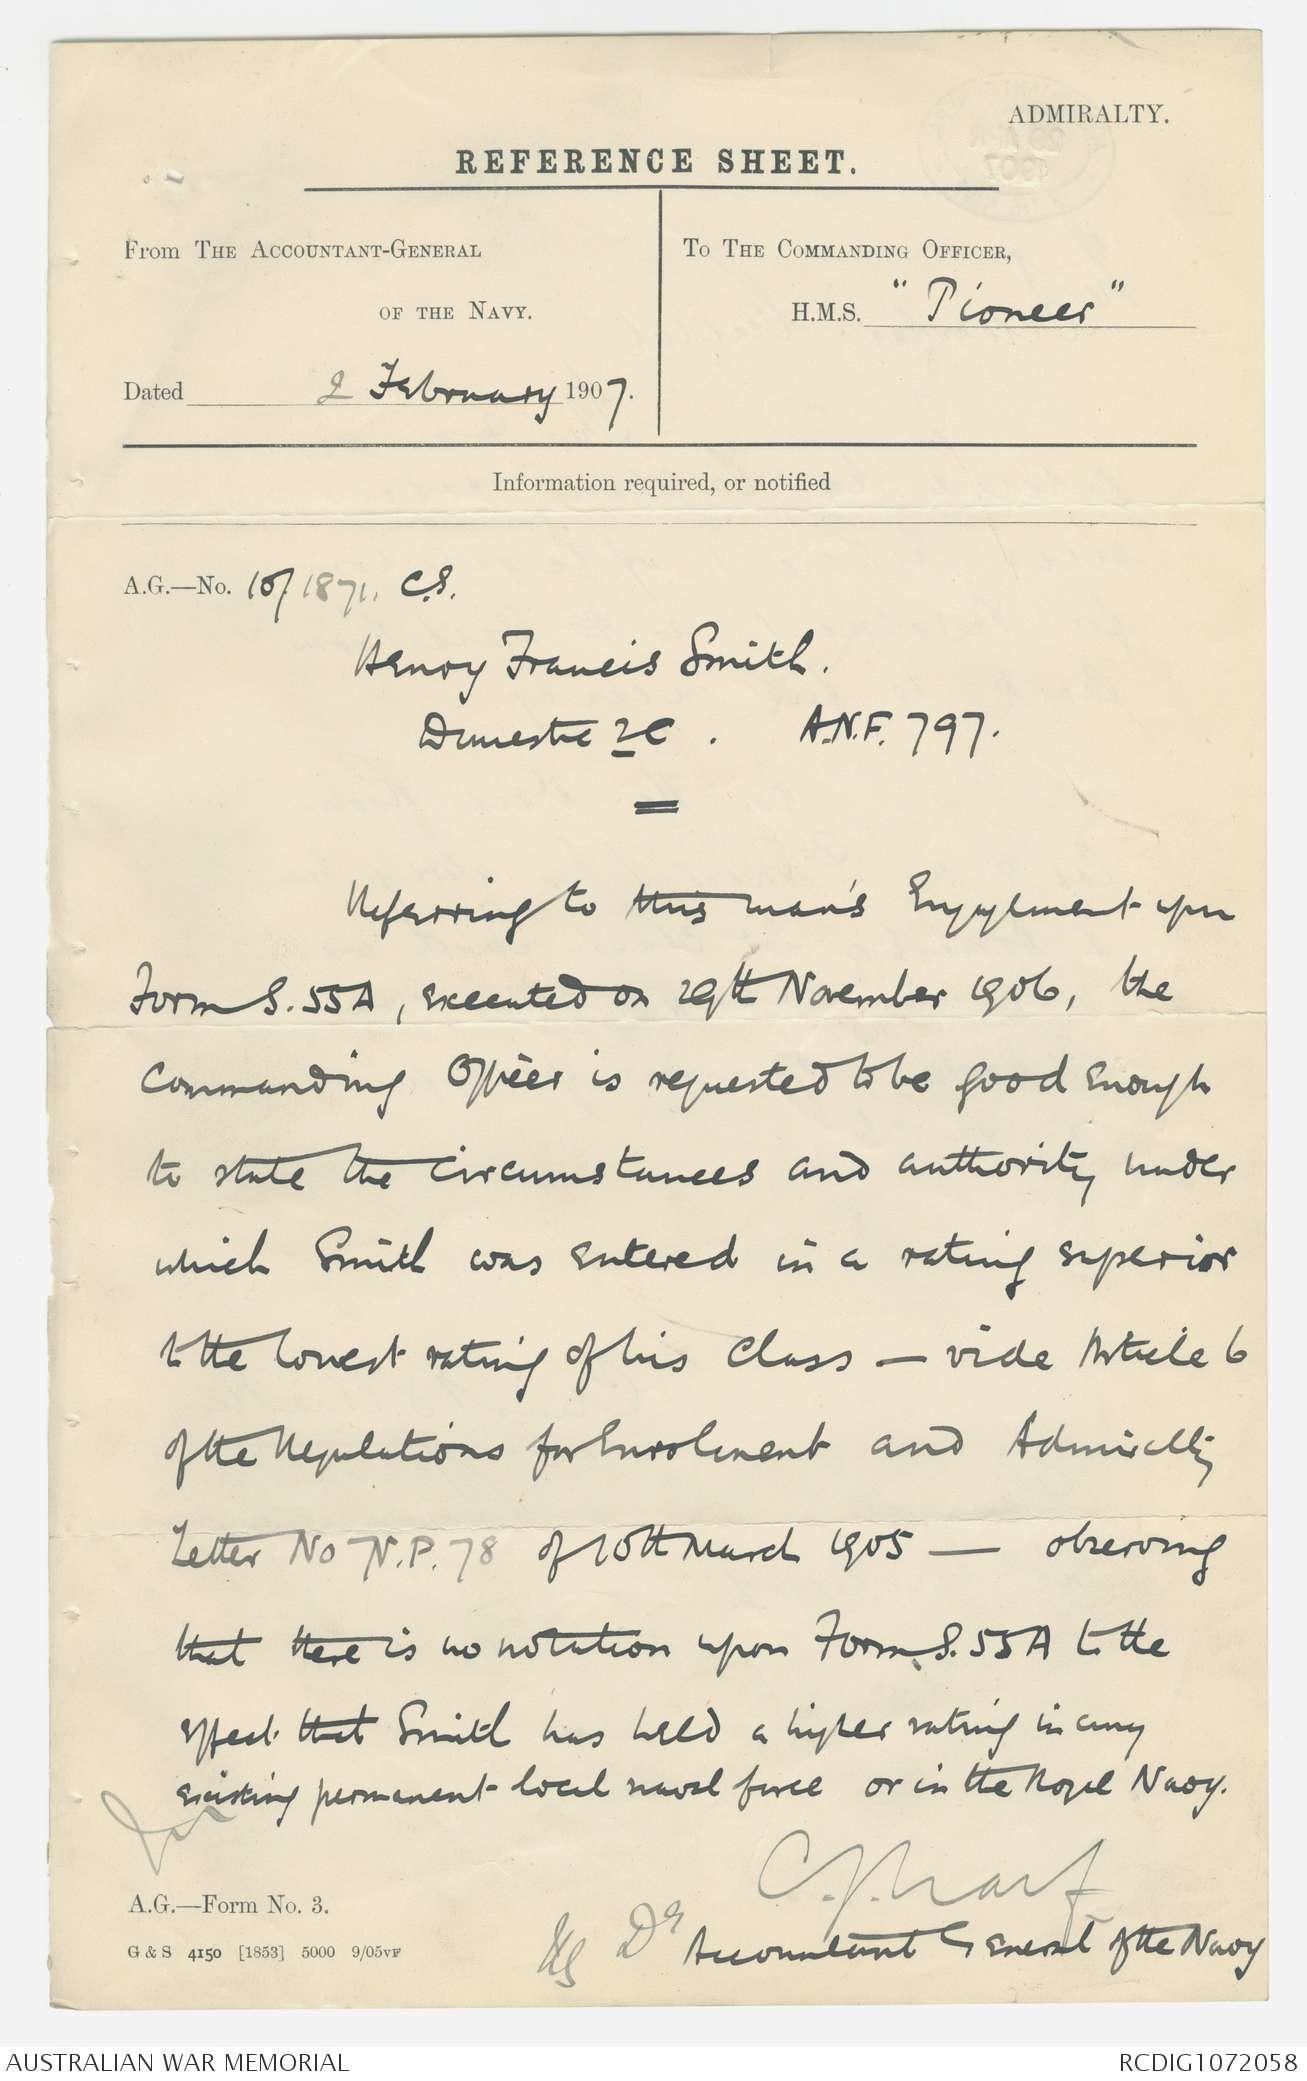 AWM266 3/1/797 - 797 Henry Francis Smith | The Australian War Memorial